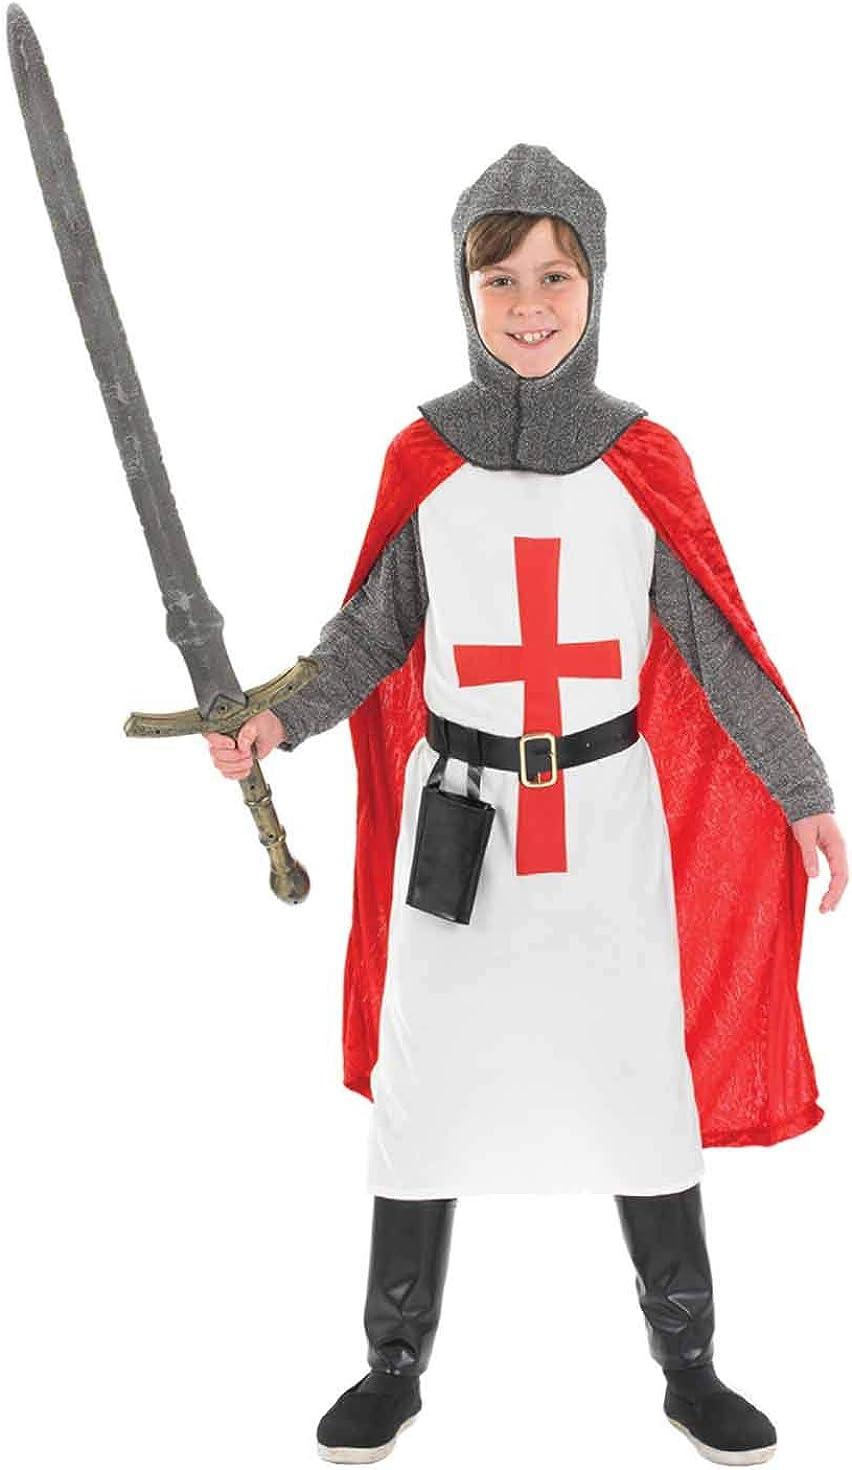 Girls Boys Kids 4 Piece Childrens Knight Weapons Armour Fancy Dress Accessory